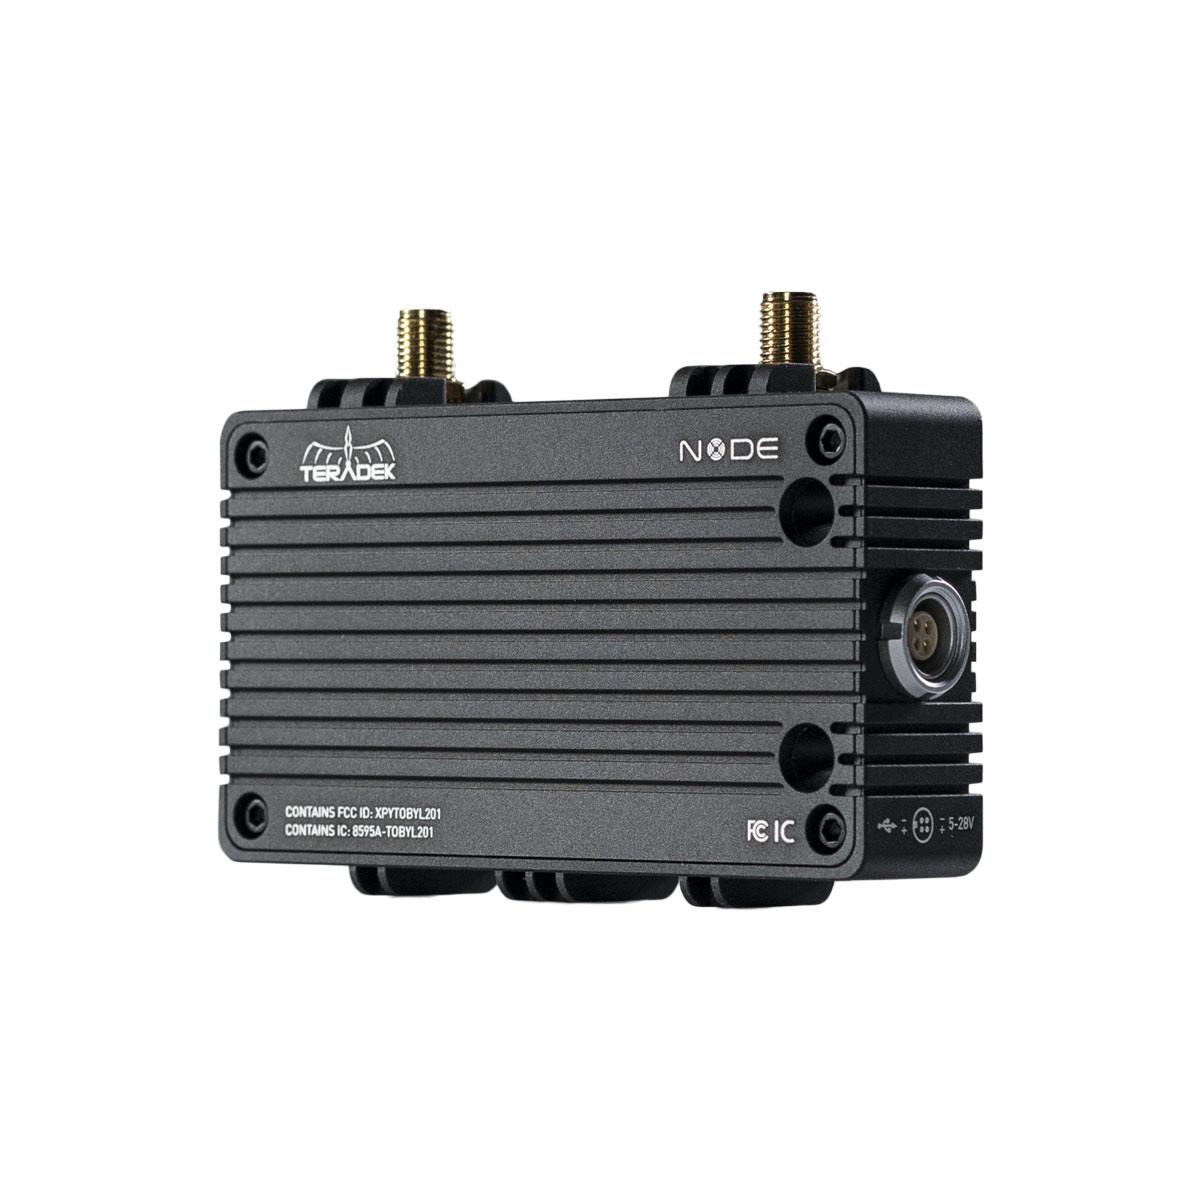 Node - 3G/4G/LTE Modem -4-pin to 4-pin / Japan